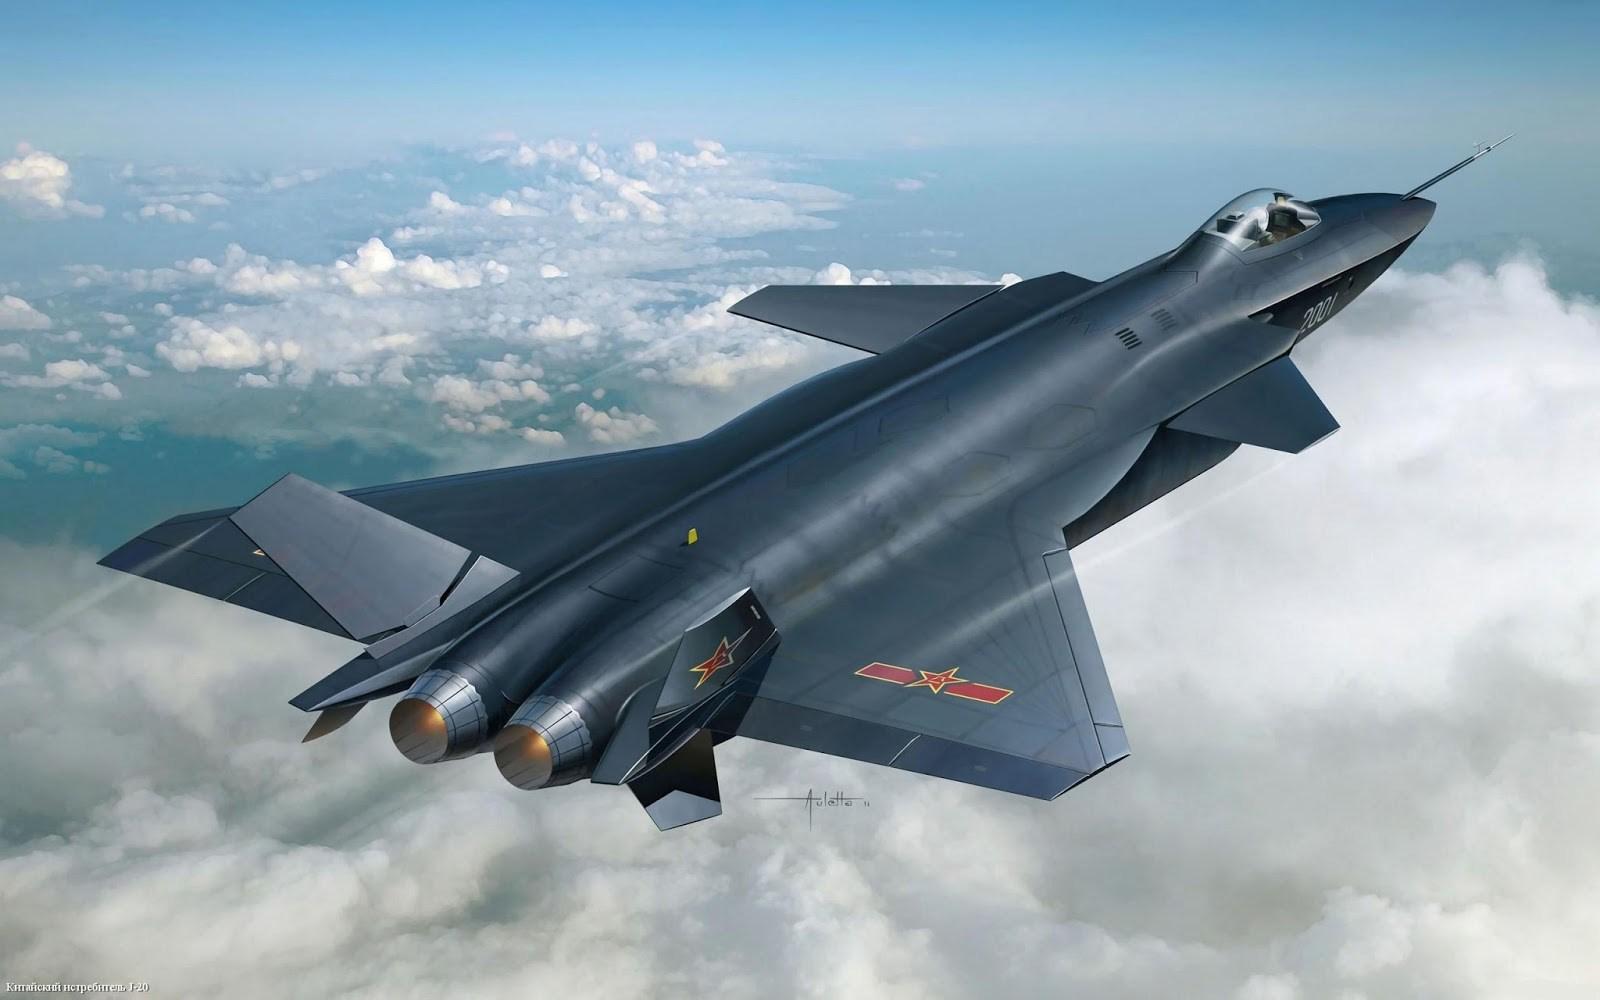 Chengdu J-20 جت جنگنده نسل جدید و پیشرفته کشور چین